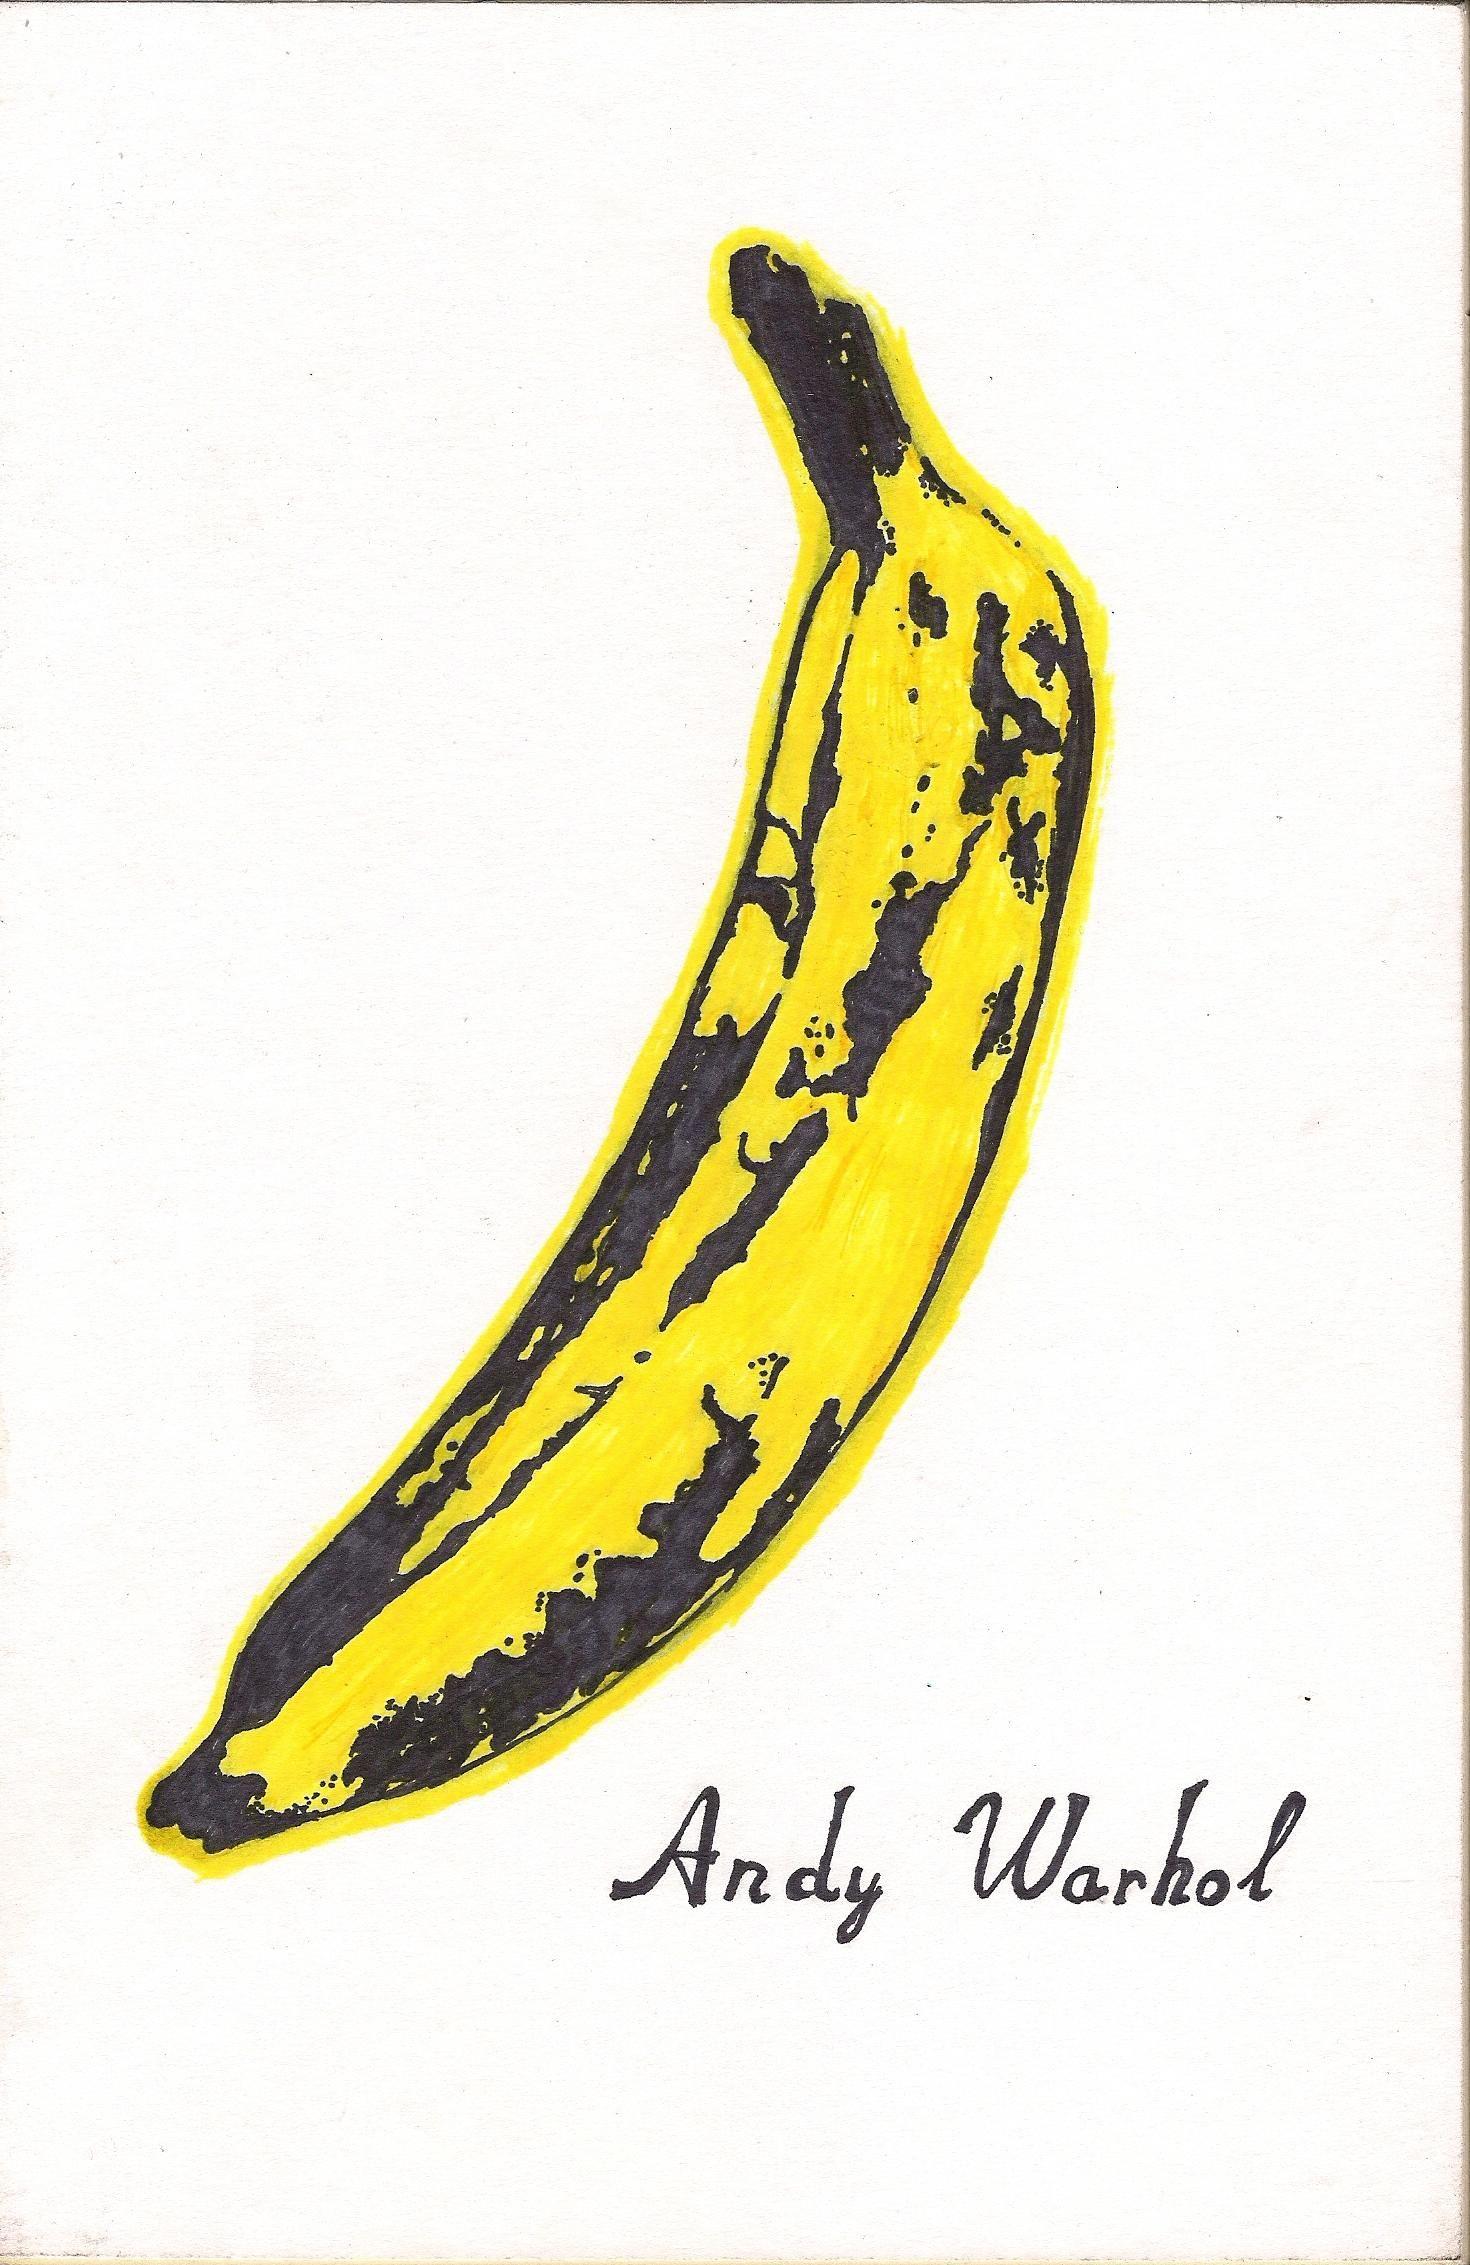 les 25 meilleures id es de la cat gorie andy warhol banana sur pinterest art andy warhol andy. Black Bedroom Furniture Sets. Home Design Ideas